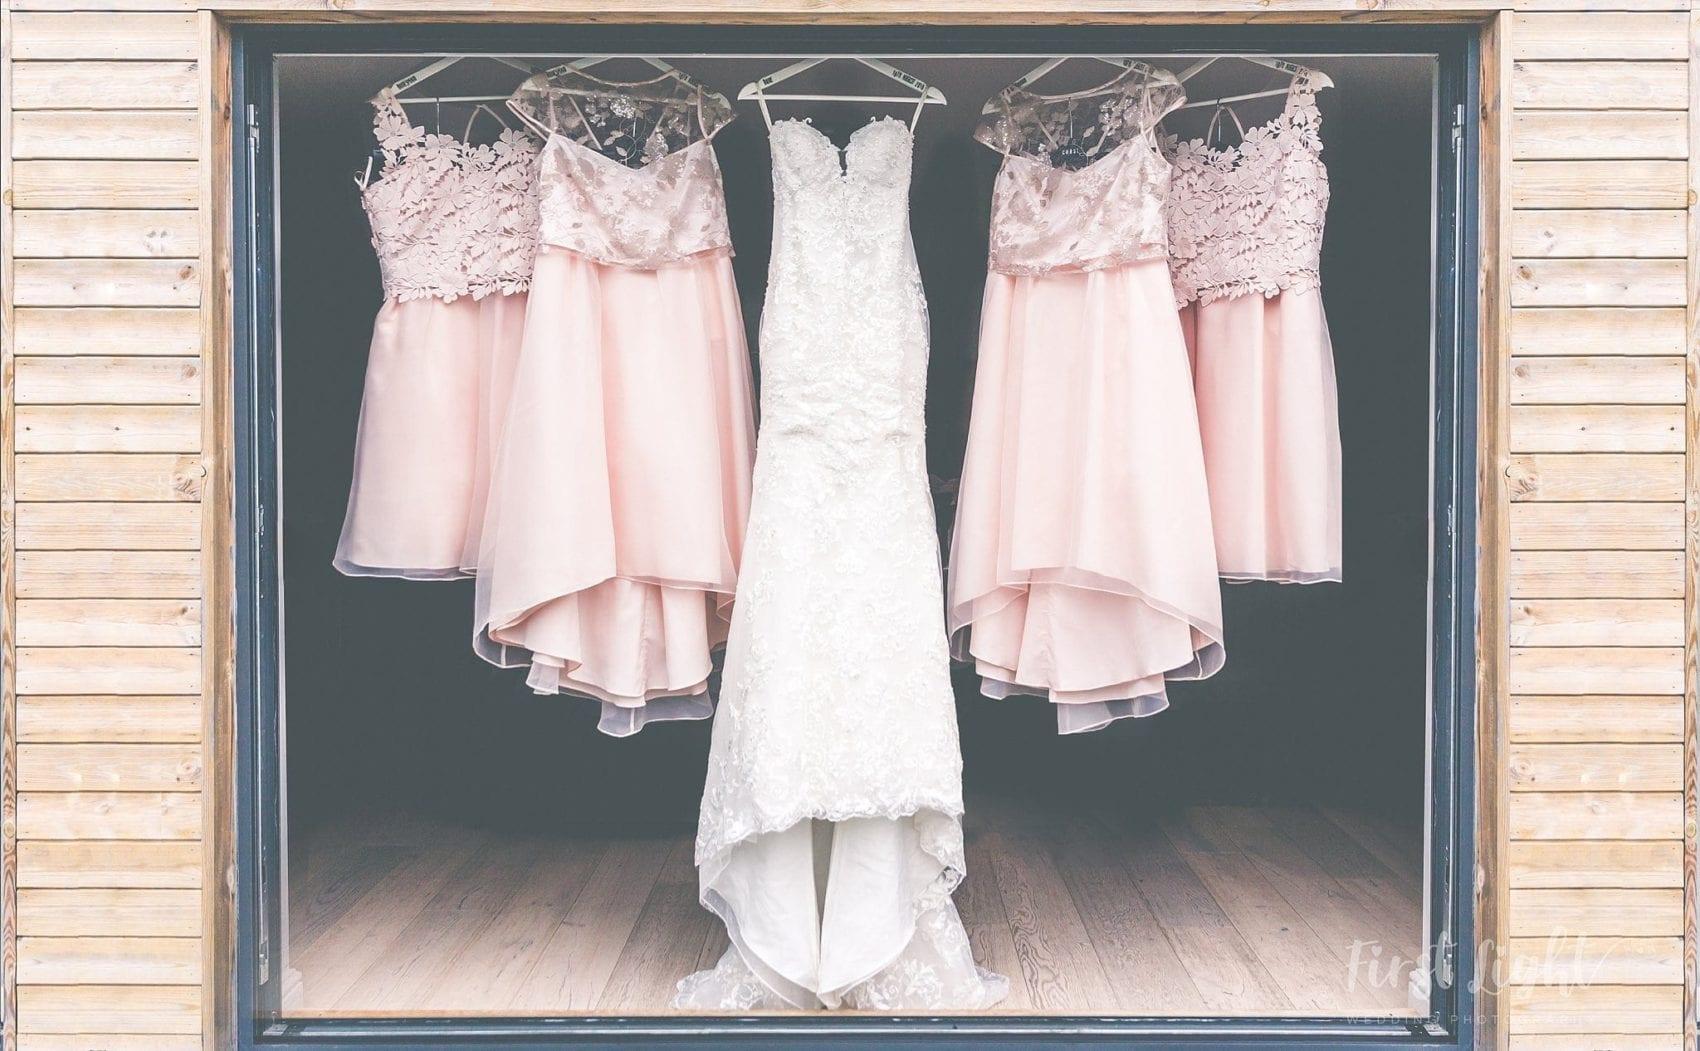 Wedding, dresses, bridesmaids, picture perfect, shepherd's hut, hanging, elegant, ever after, lower grenofen, Pre-wedding